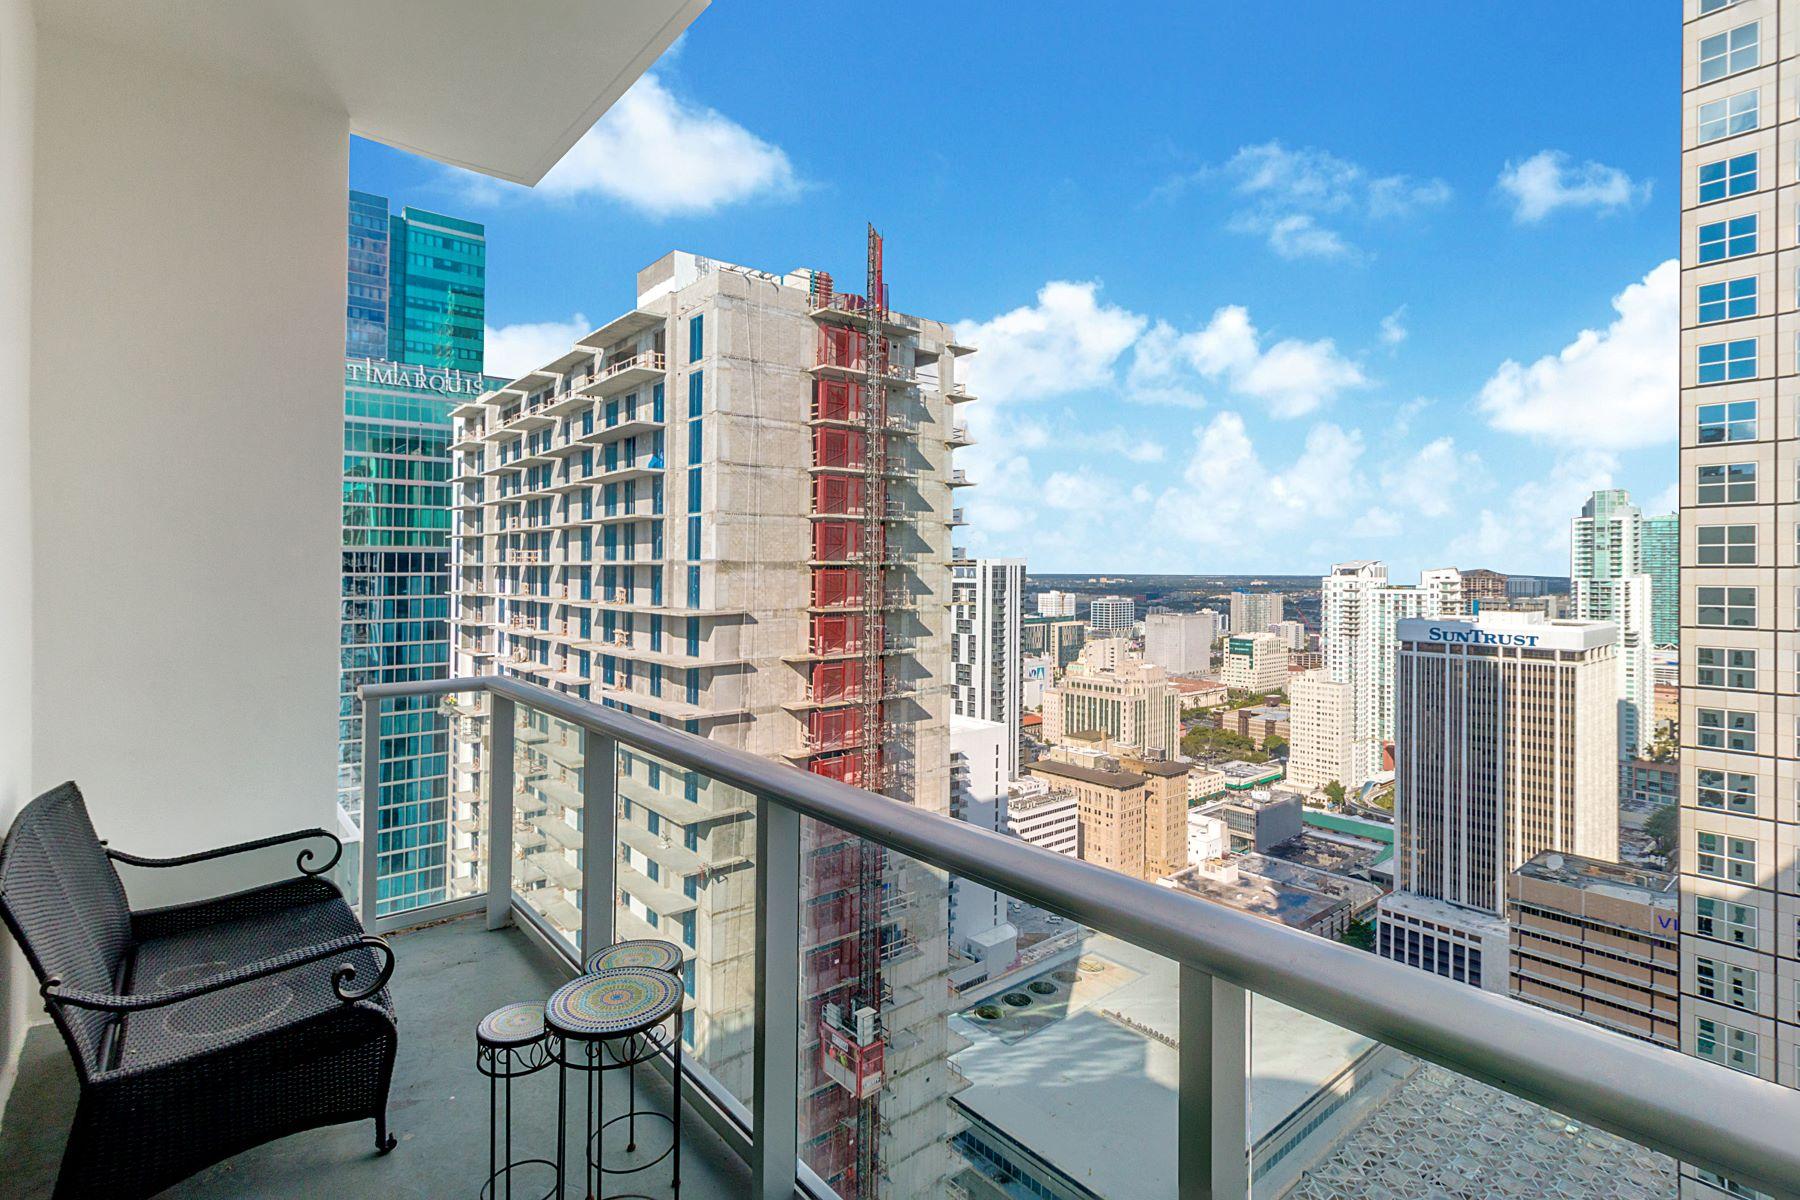 شقة بعمارة للـ Sale في 300 S Biscayne Blvd 300 S Biscayne Blvd PH3903, Miami, Florida, 33131 United States